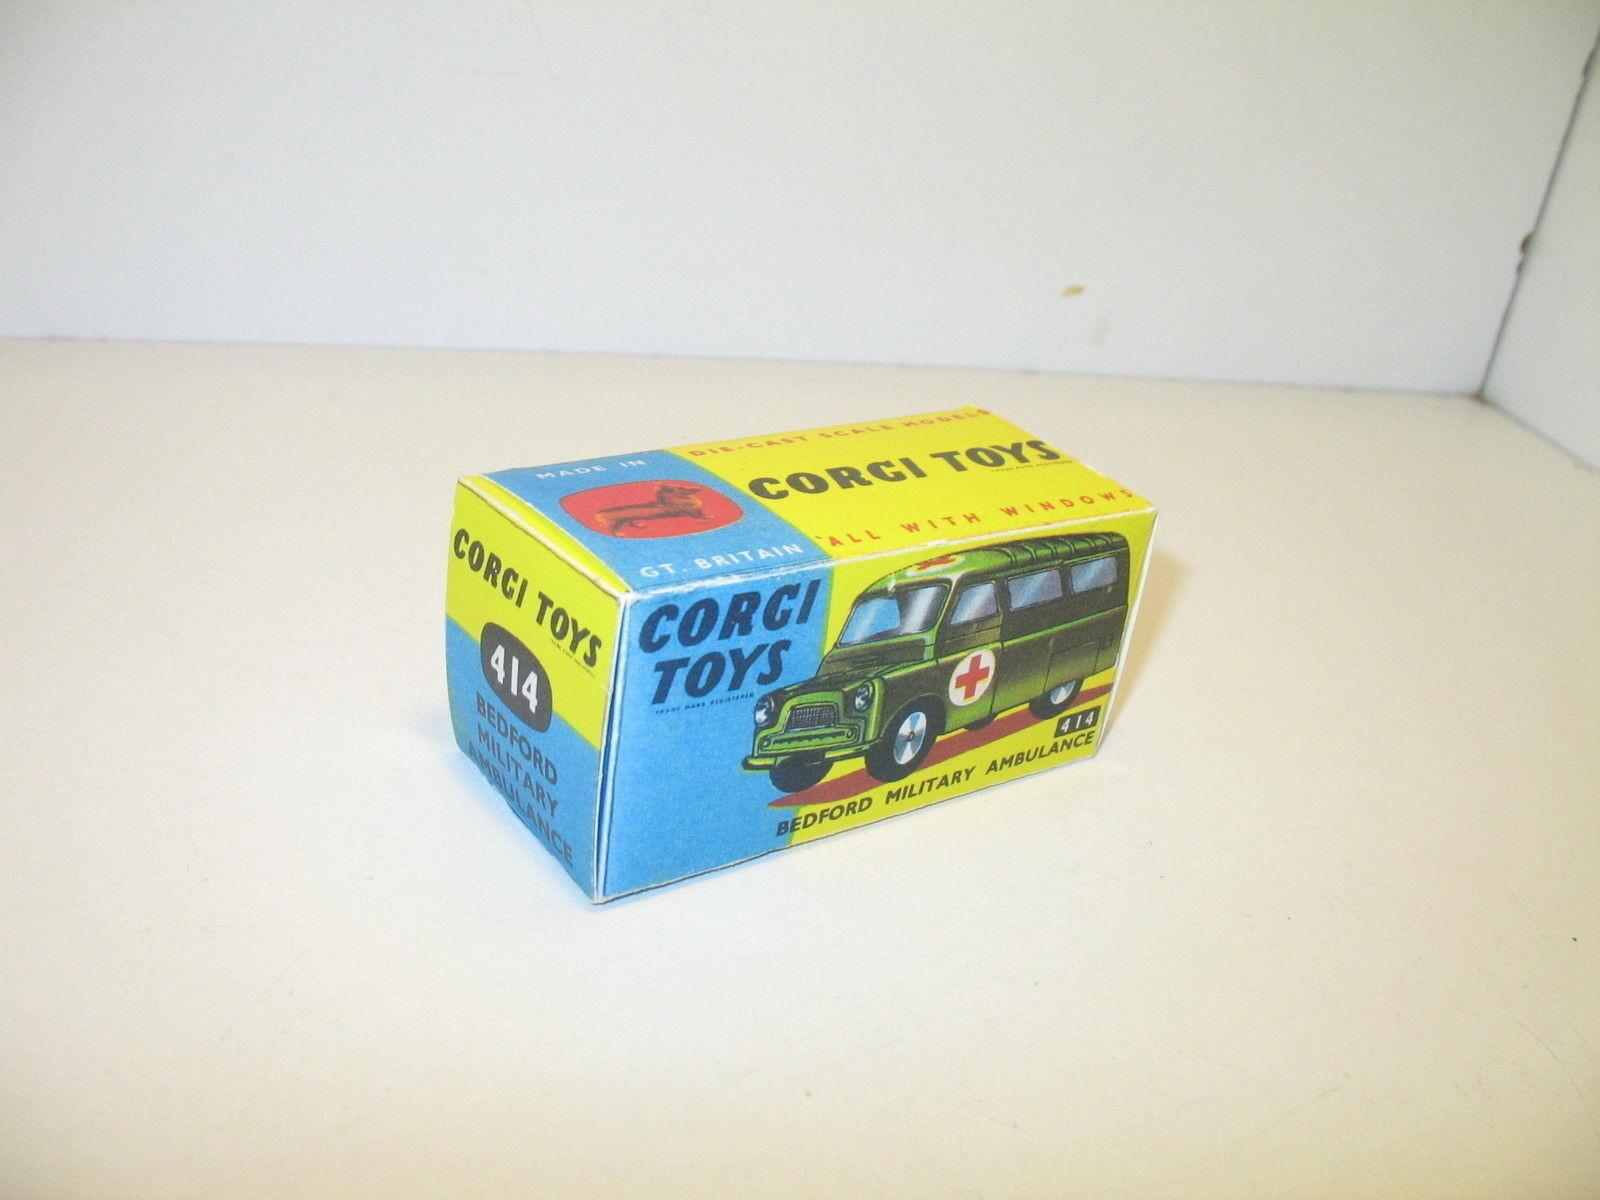 N86, Schachtel repro bedford Militär Ambulanz, CORGI Spielzeug Armee